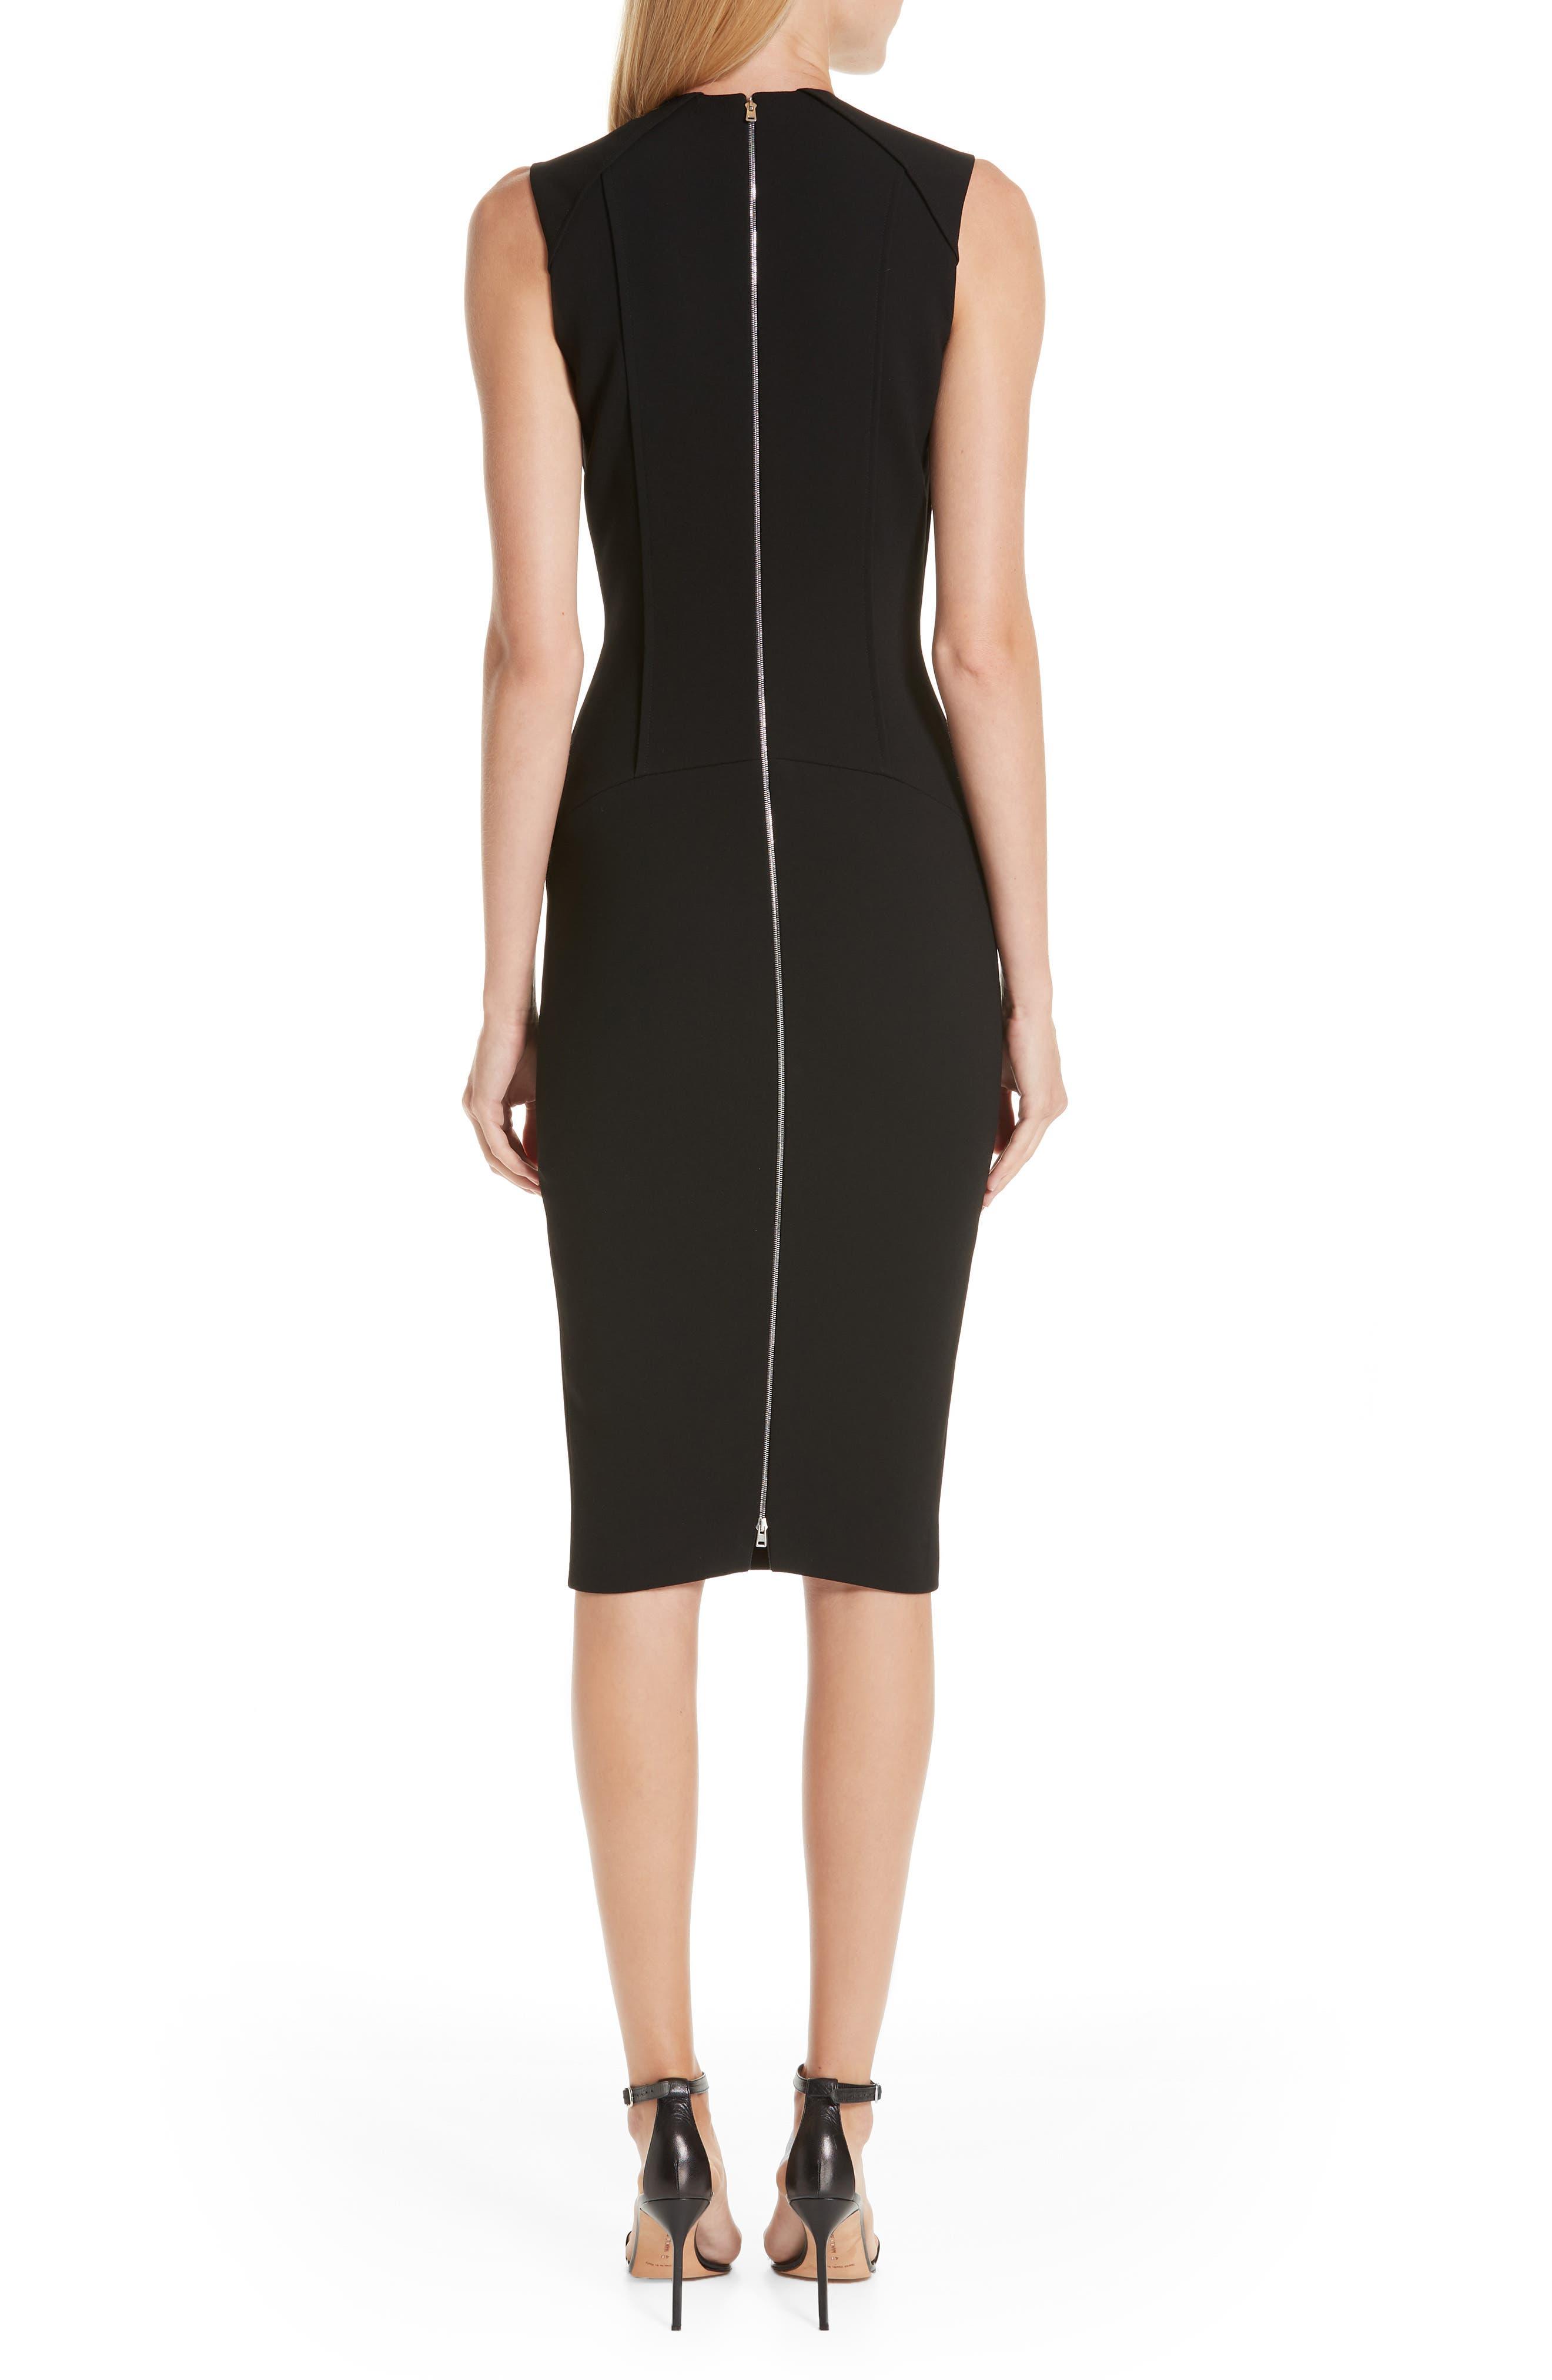 VICTORIA BECKHAM, Back Zip Body-Con Dress, Alternate thumbnail 2, color, BLACK